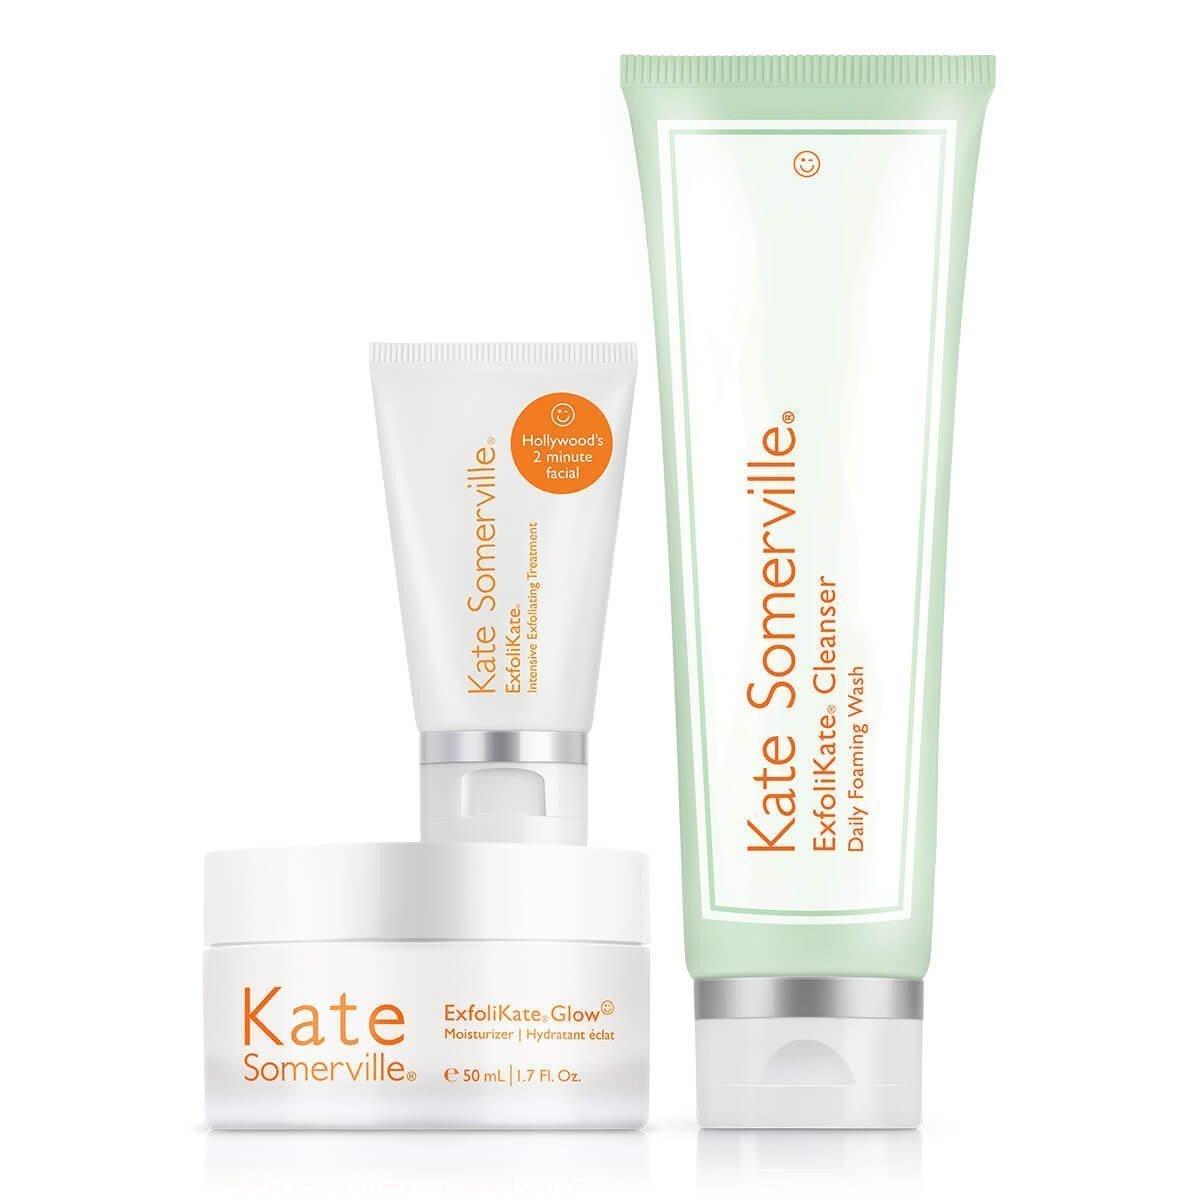 Kate Somerville ExfoliKate Glow Set